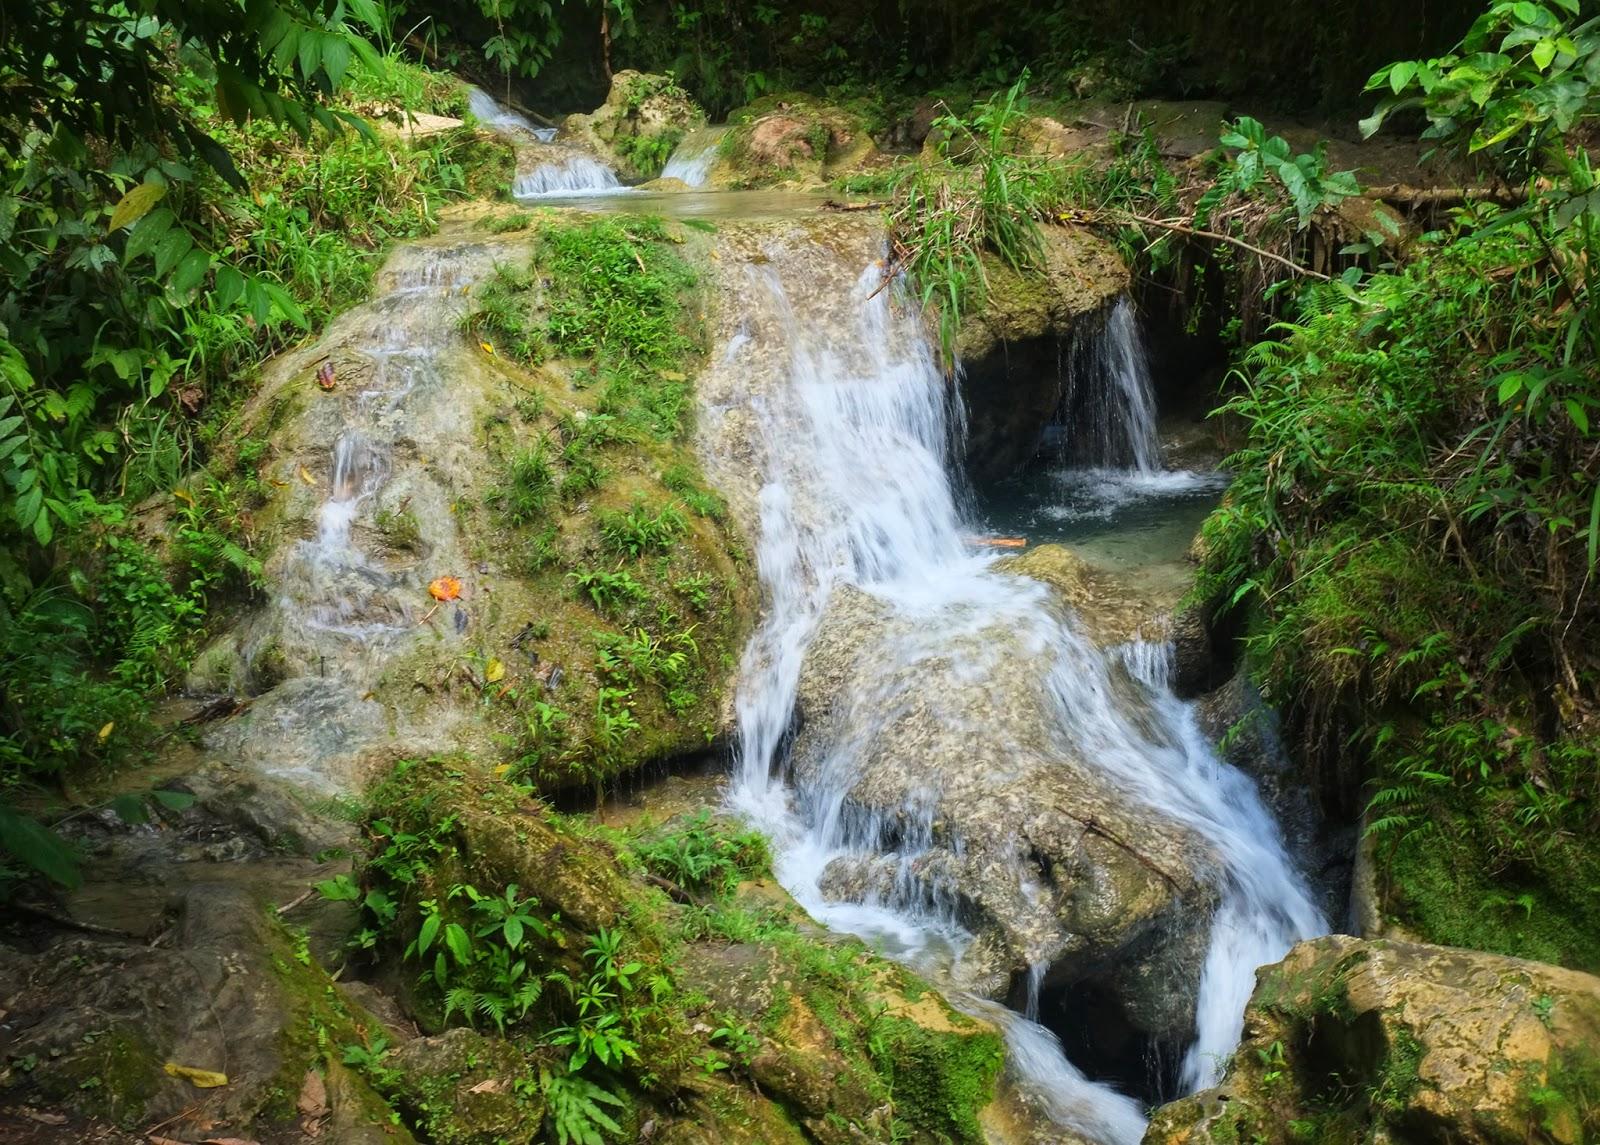 Fetam Klego: The Sinapulan Underground River in Columbio, Sultan Kudarat